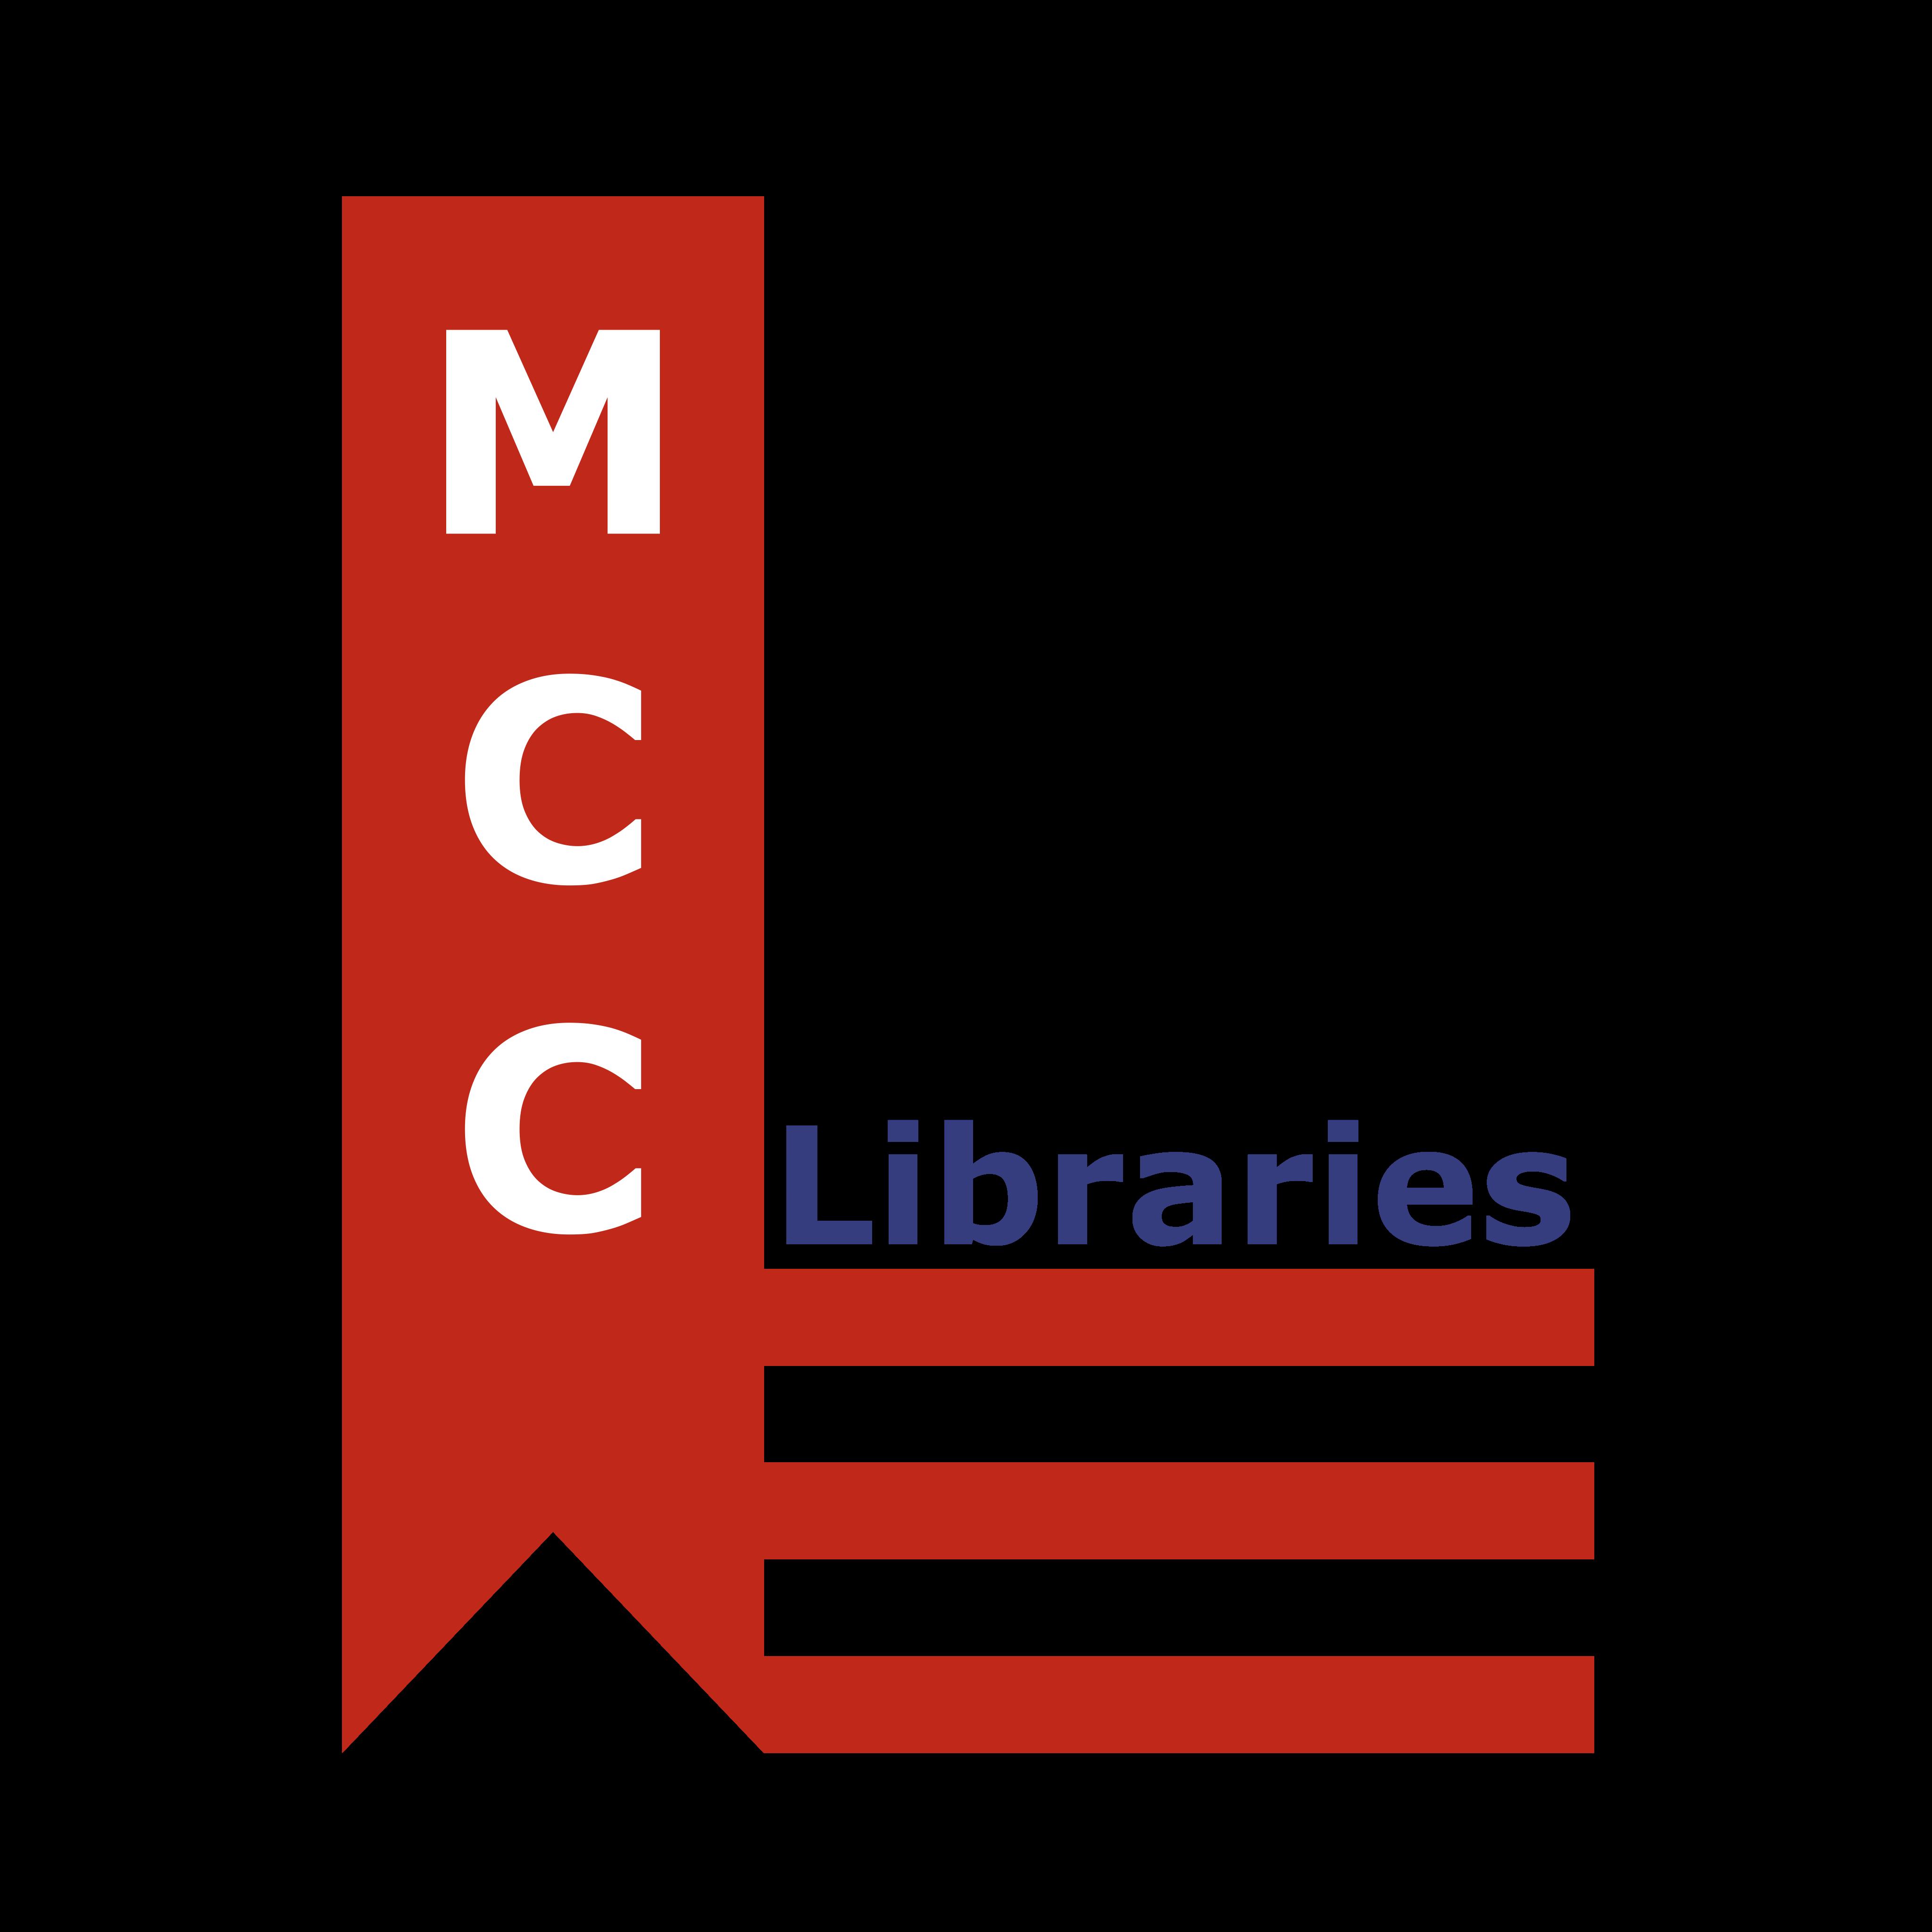 MCC Libraries Logo